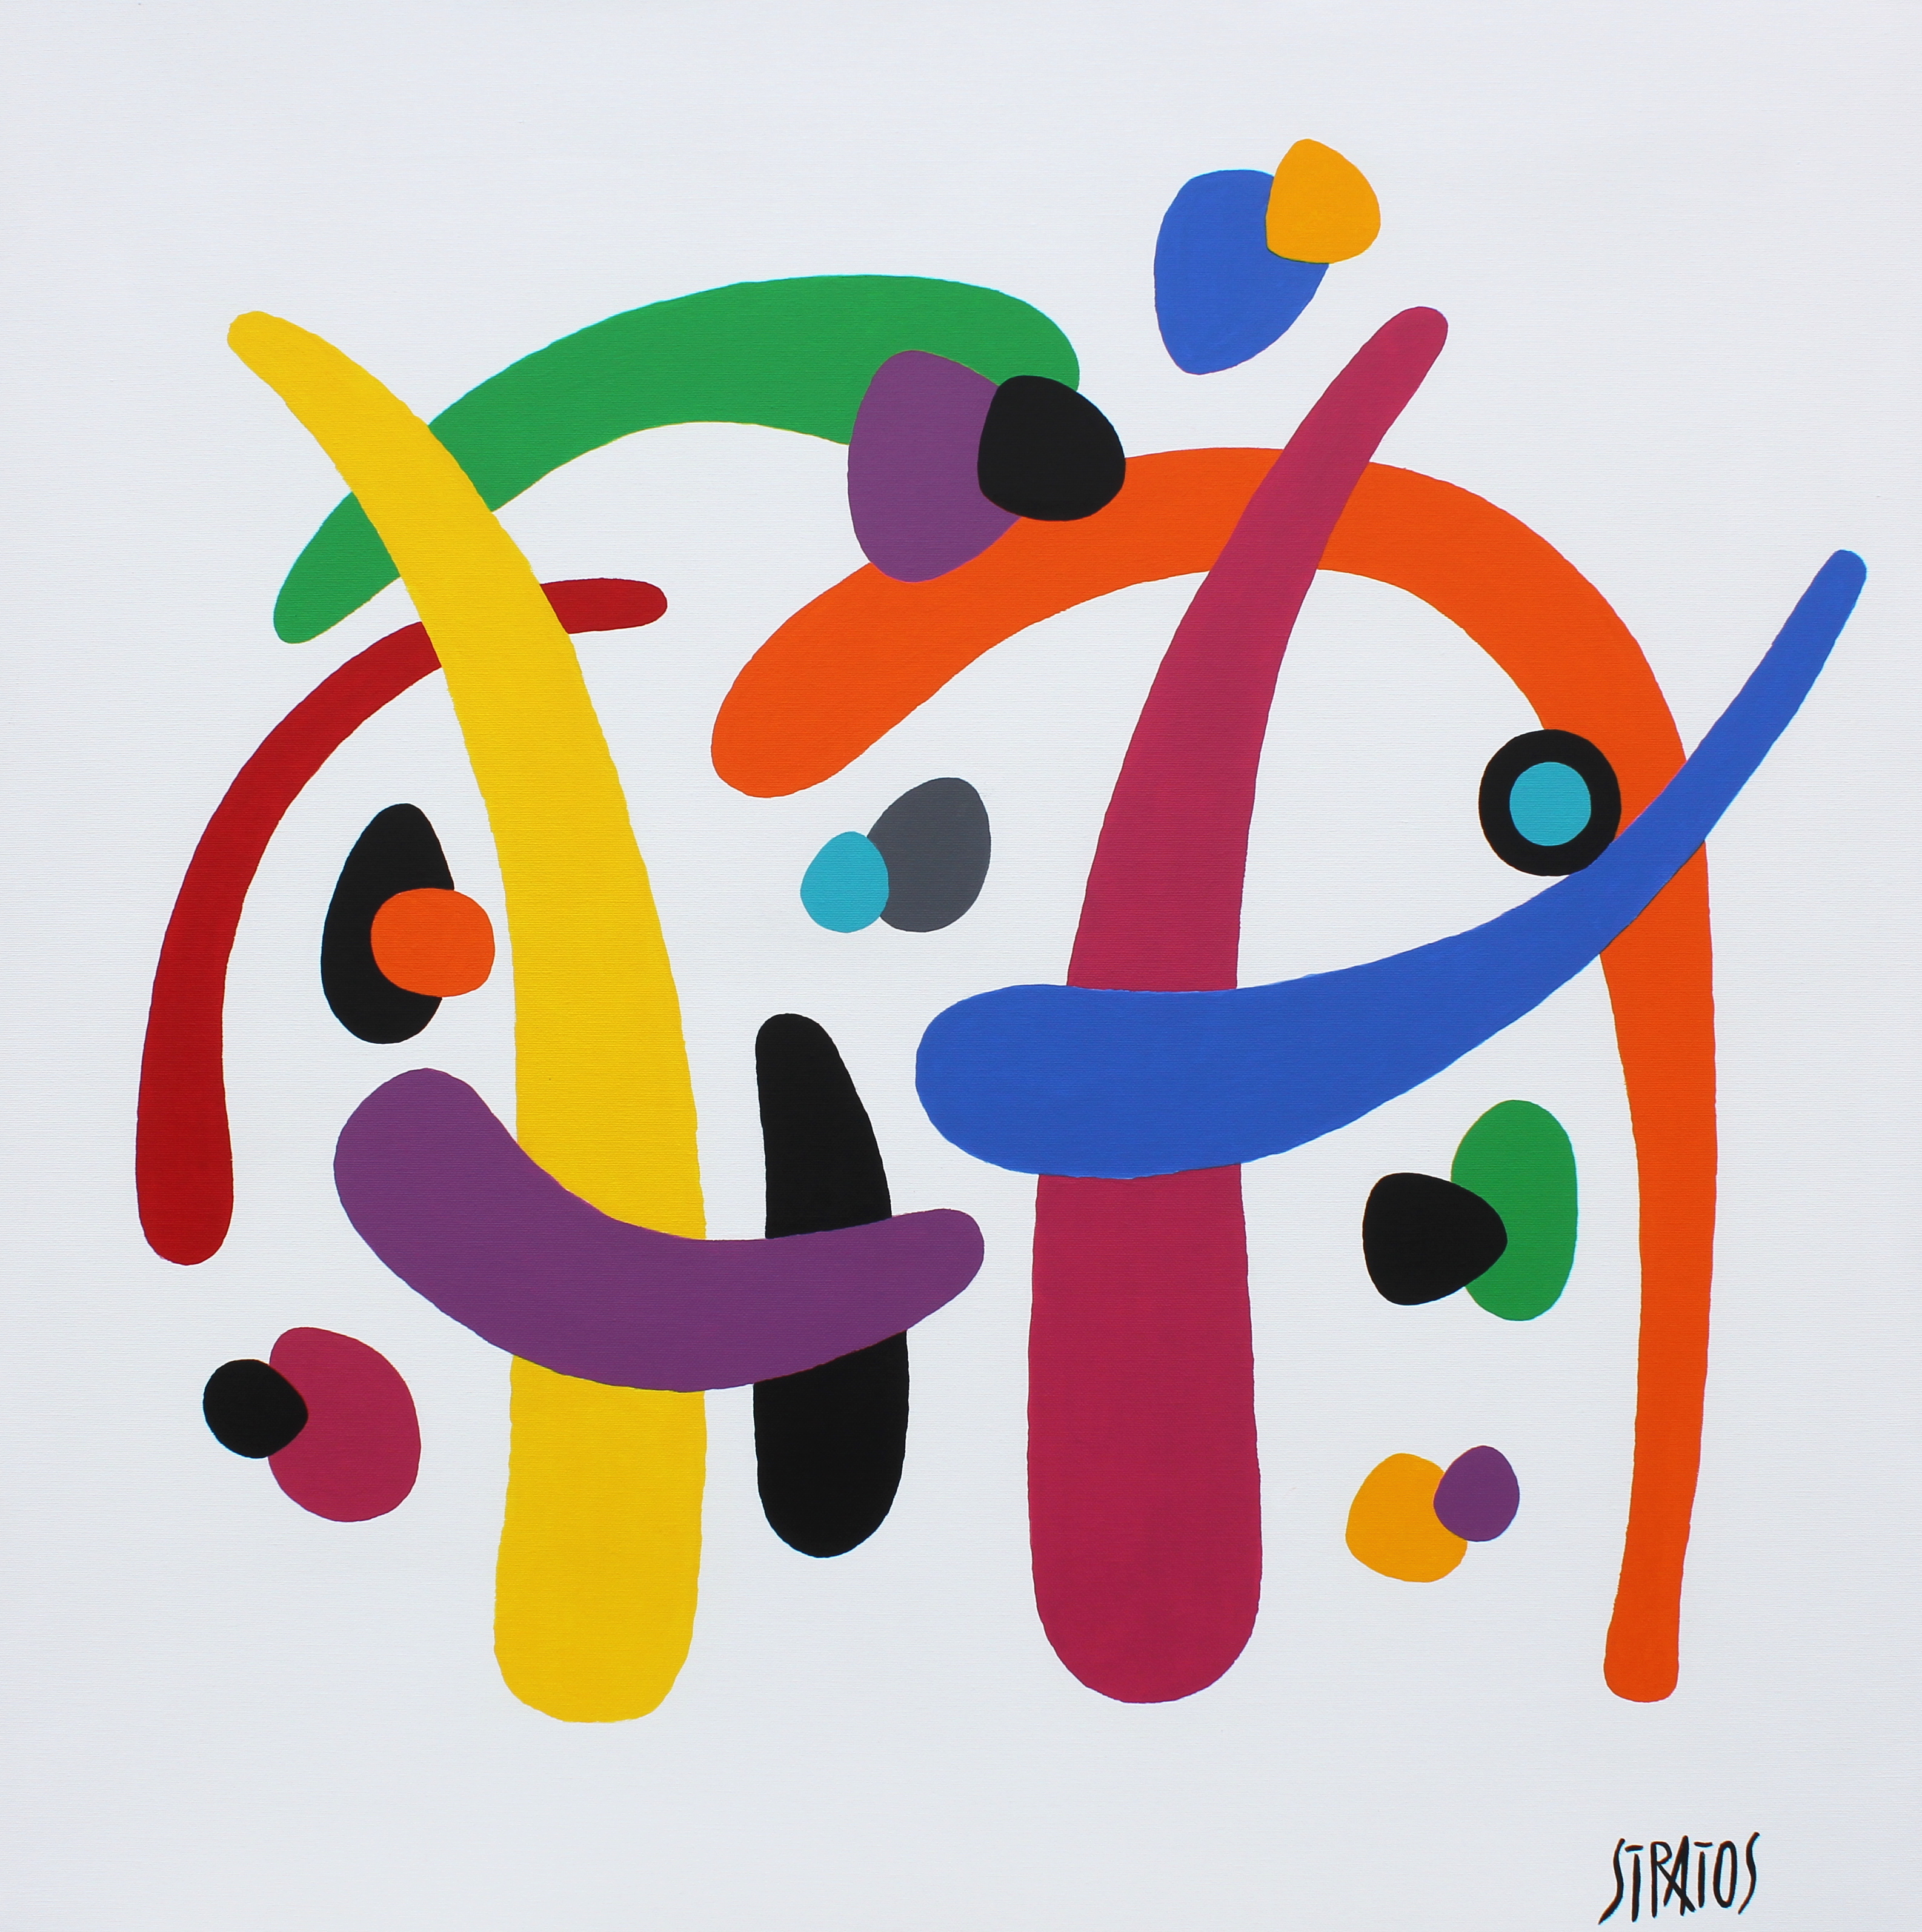 DFENDEZ MOI n°30 - 80 x 80 cm